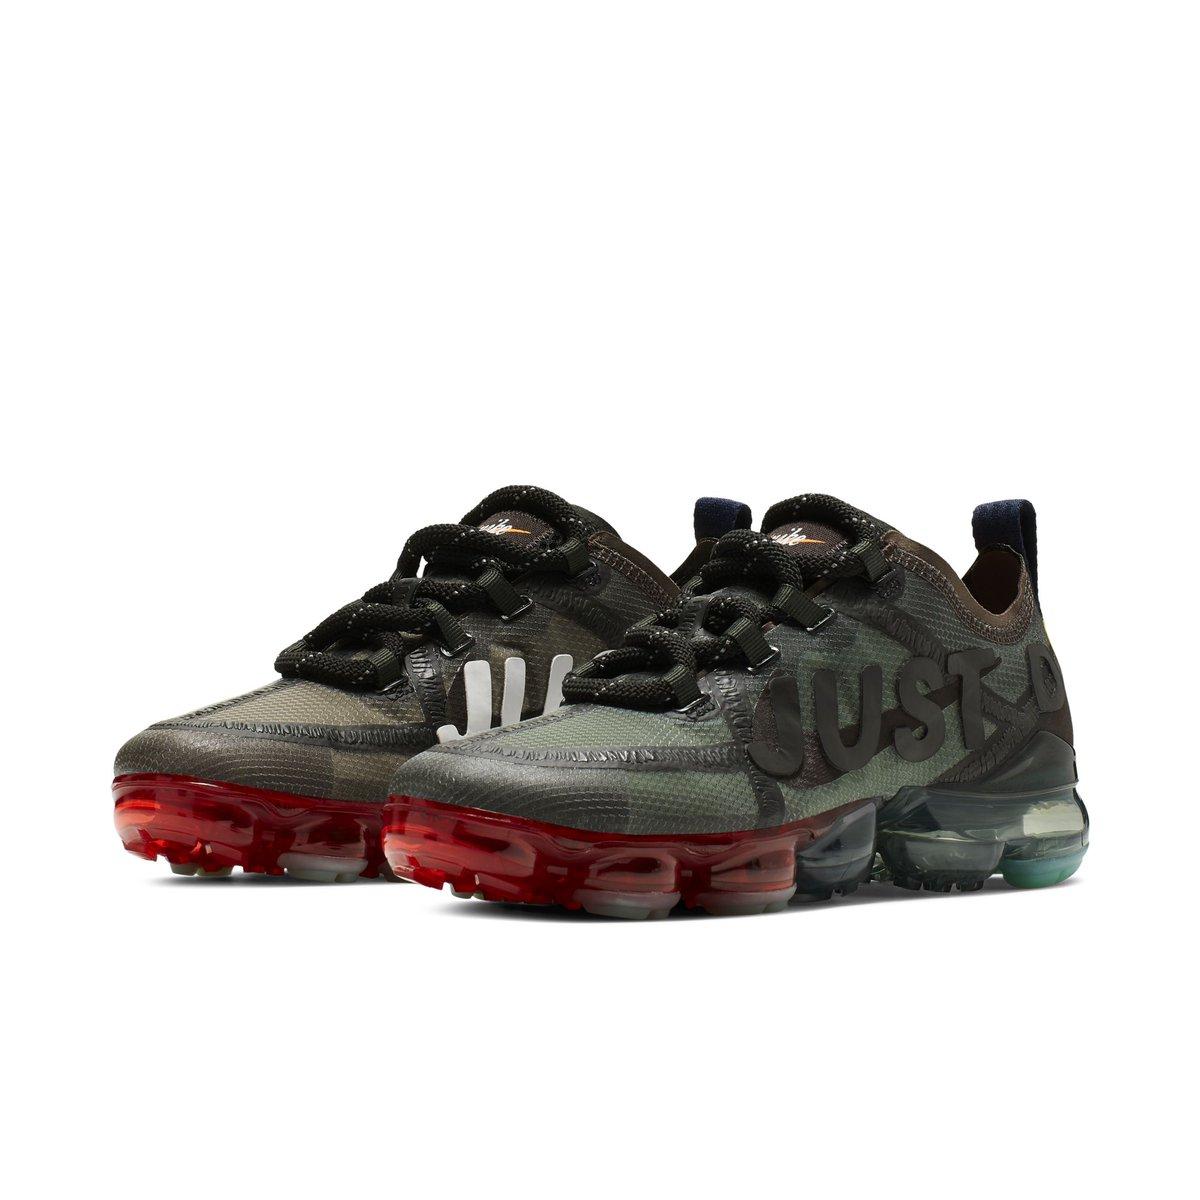 Nike,VaporMax 19,发售,CD7001-200  官网链接来了!神秘鞋款 CPFM x VaporMax 明早发售